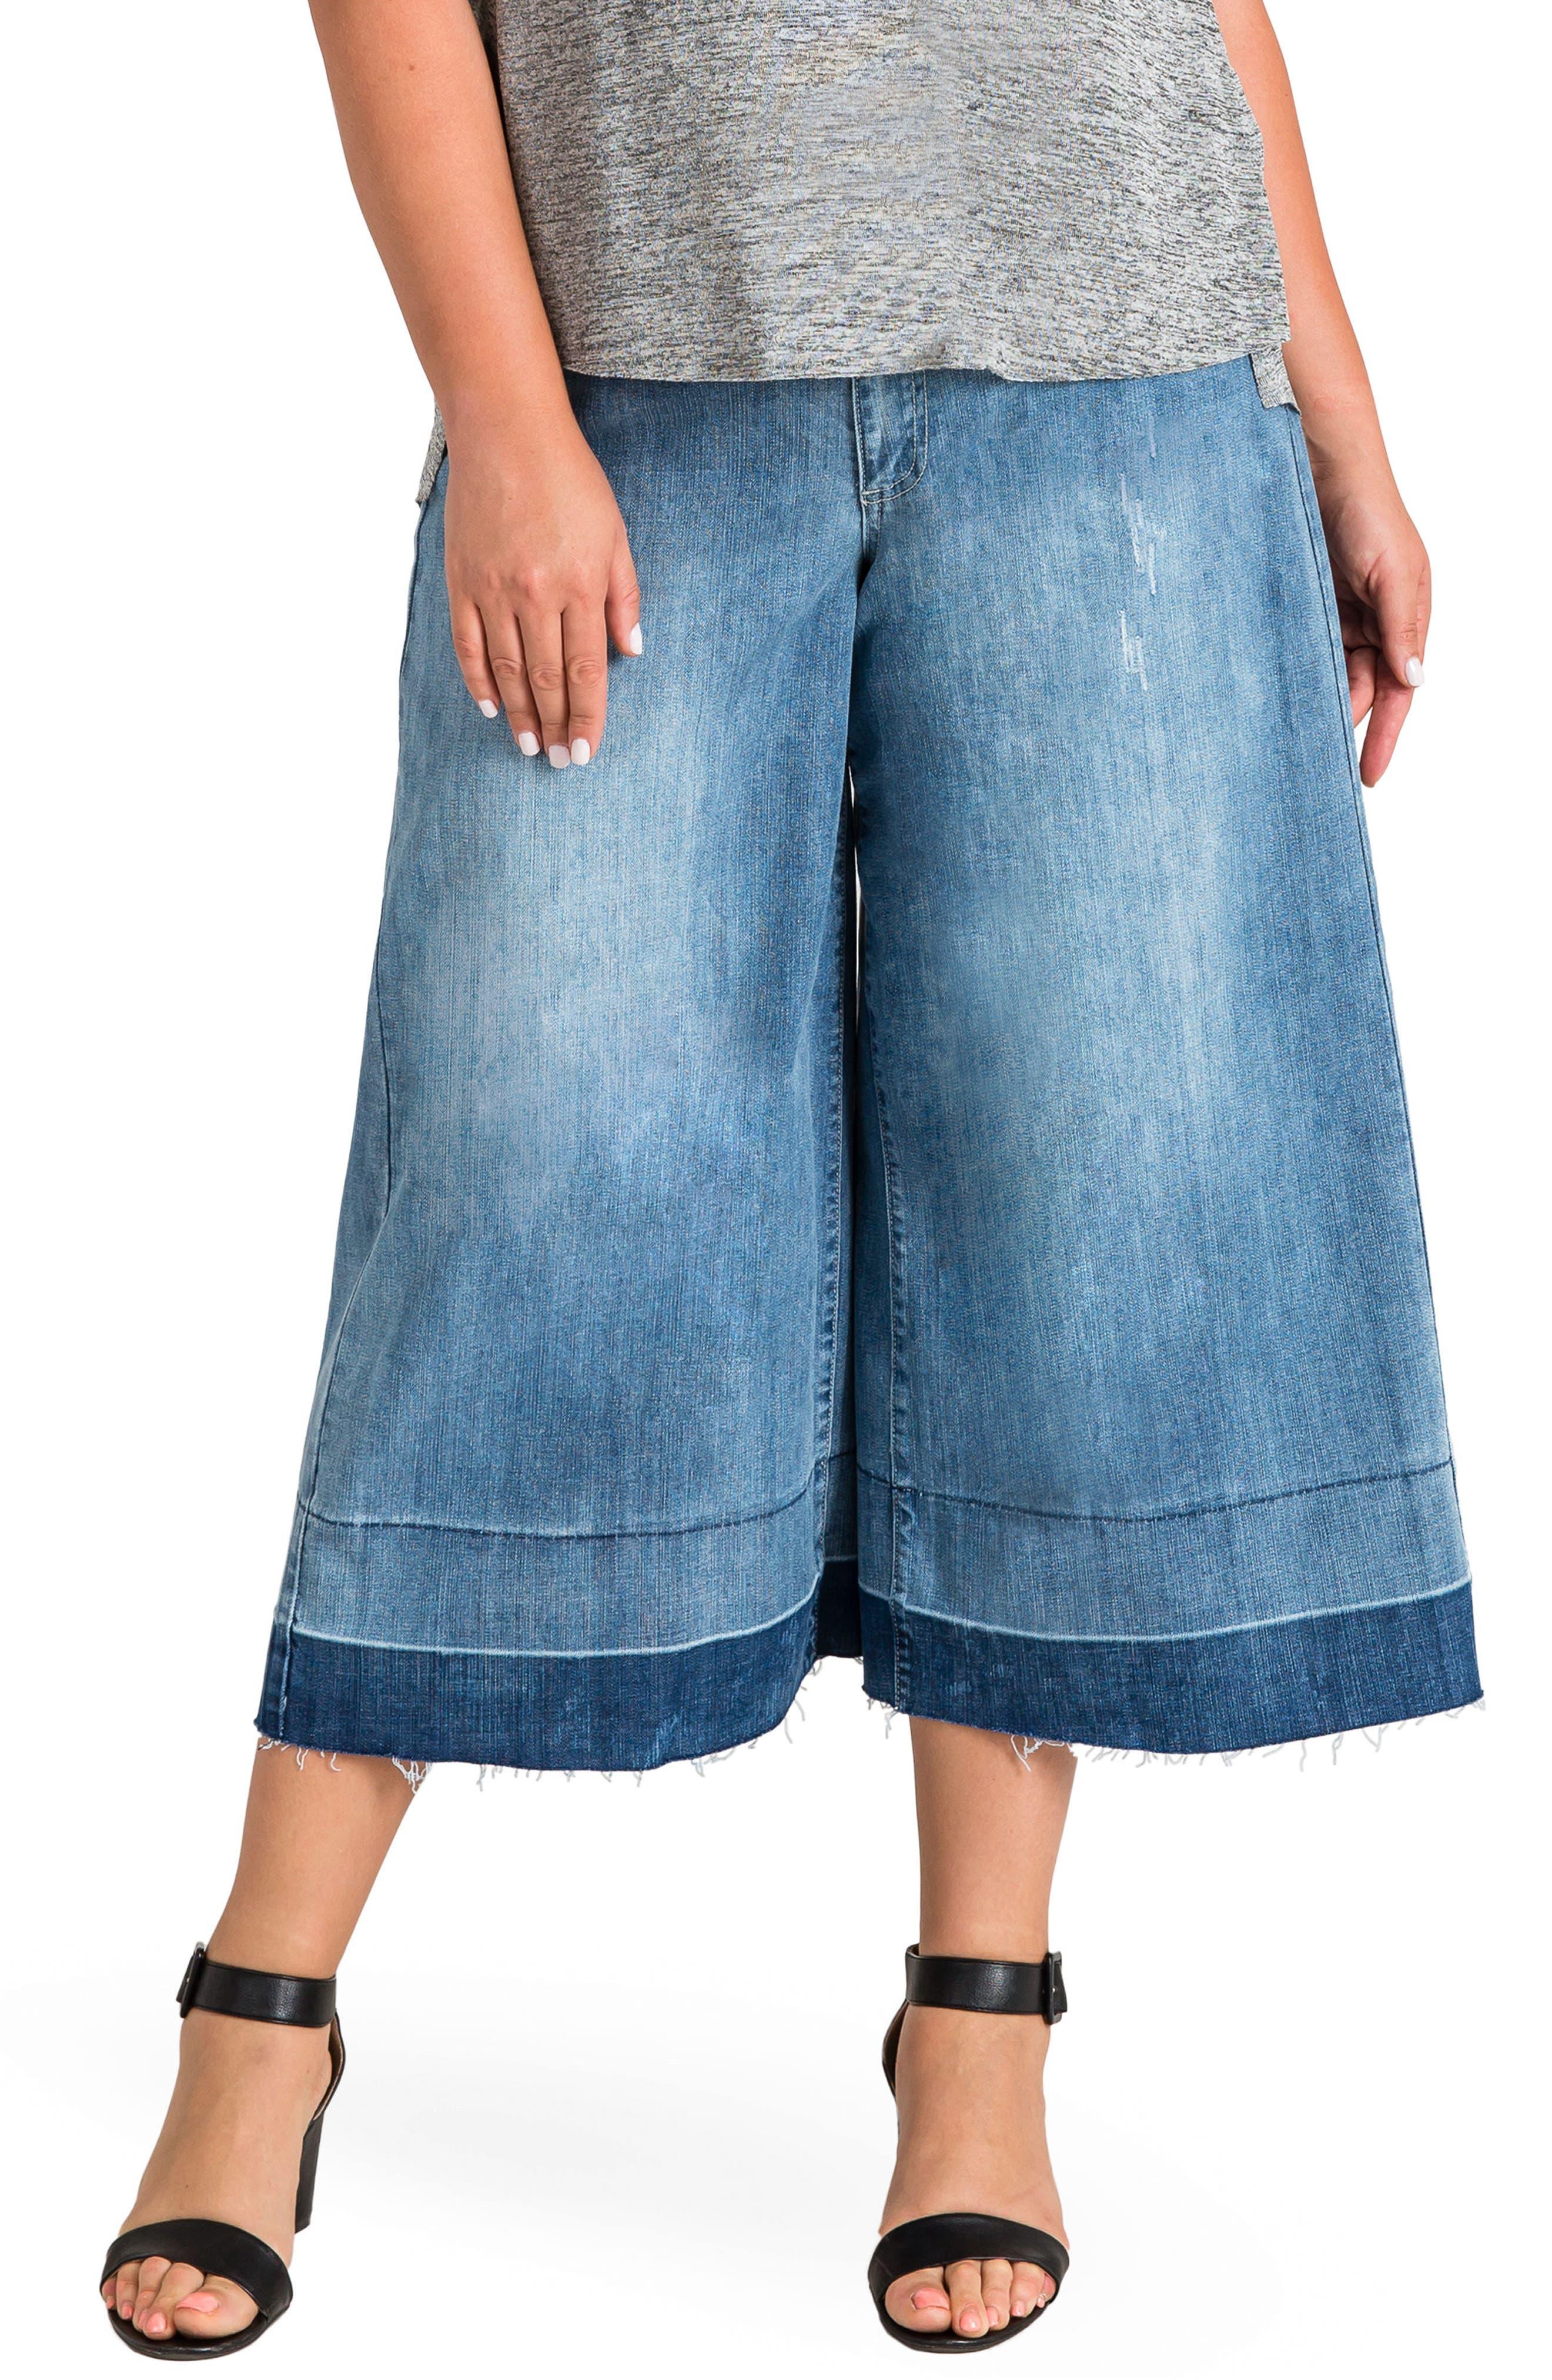 Standards & Practices Release Hem Denim Culottes (Spruce) (Plus Size)